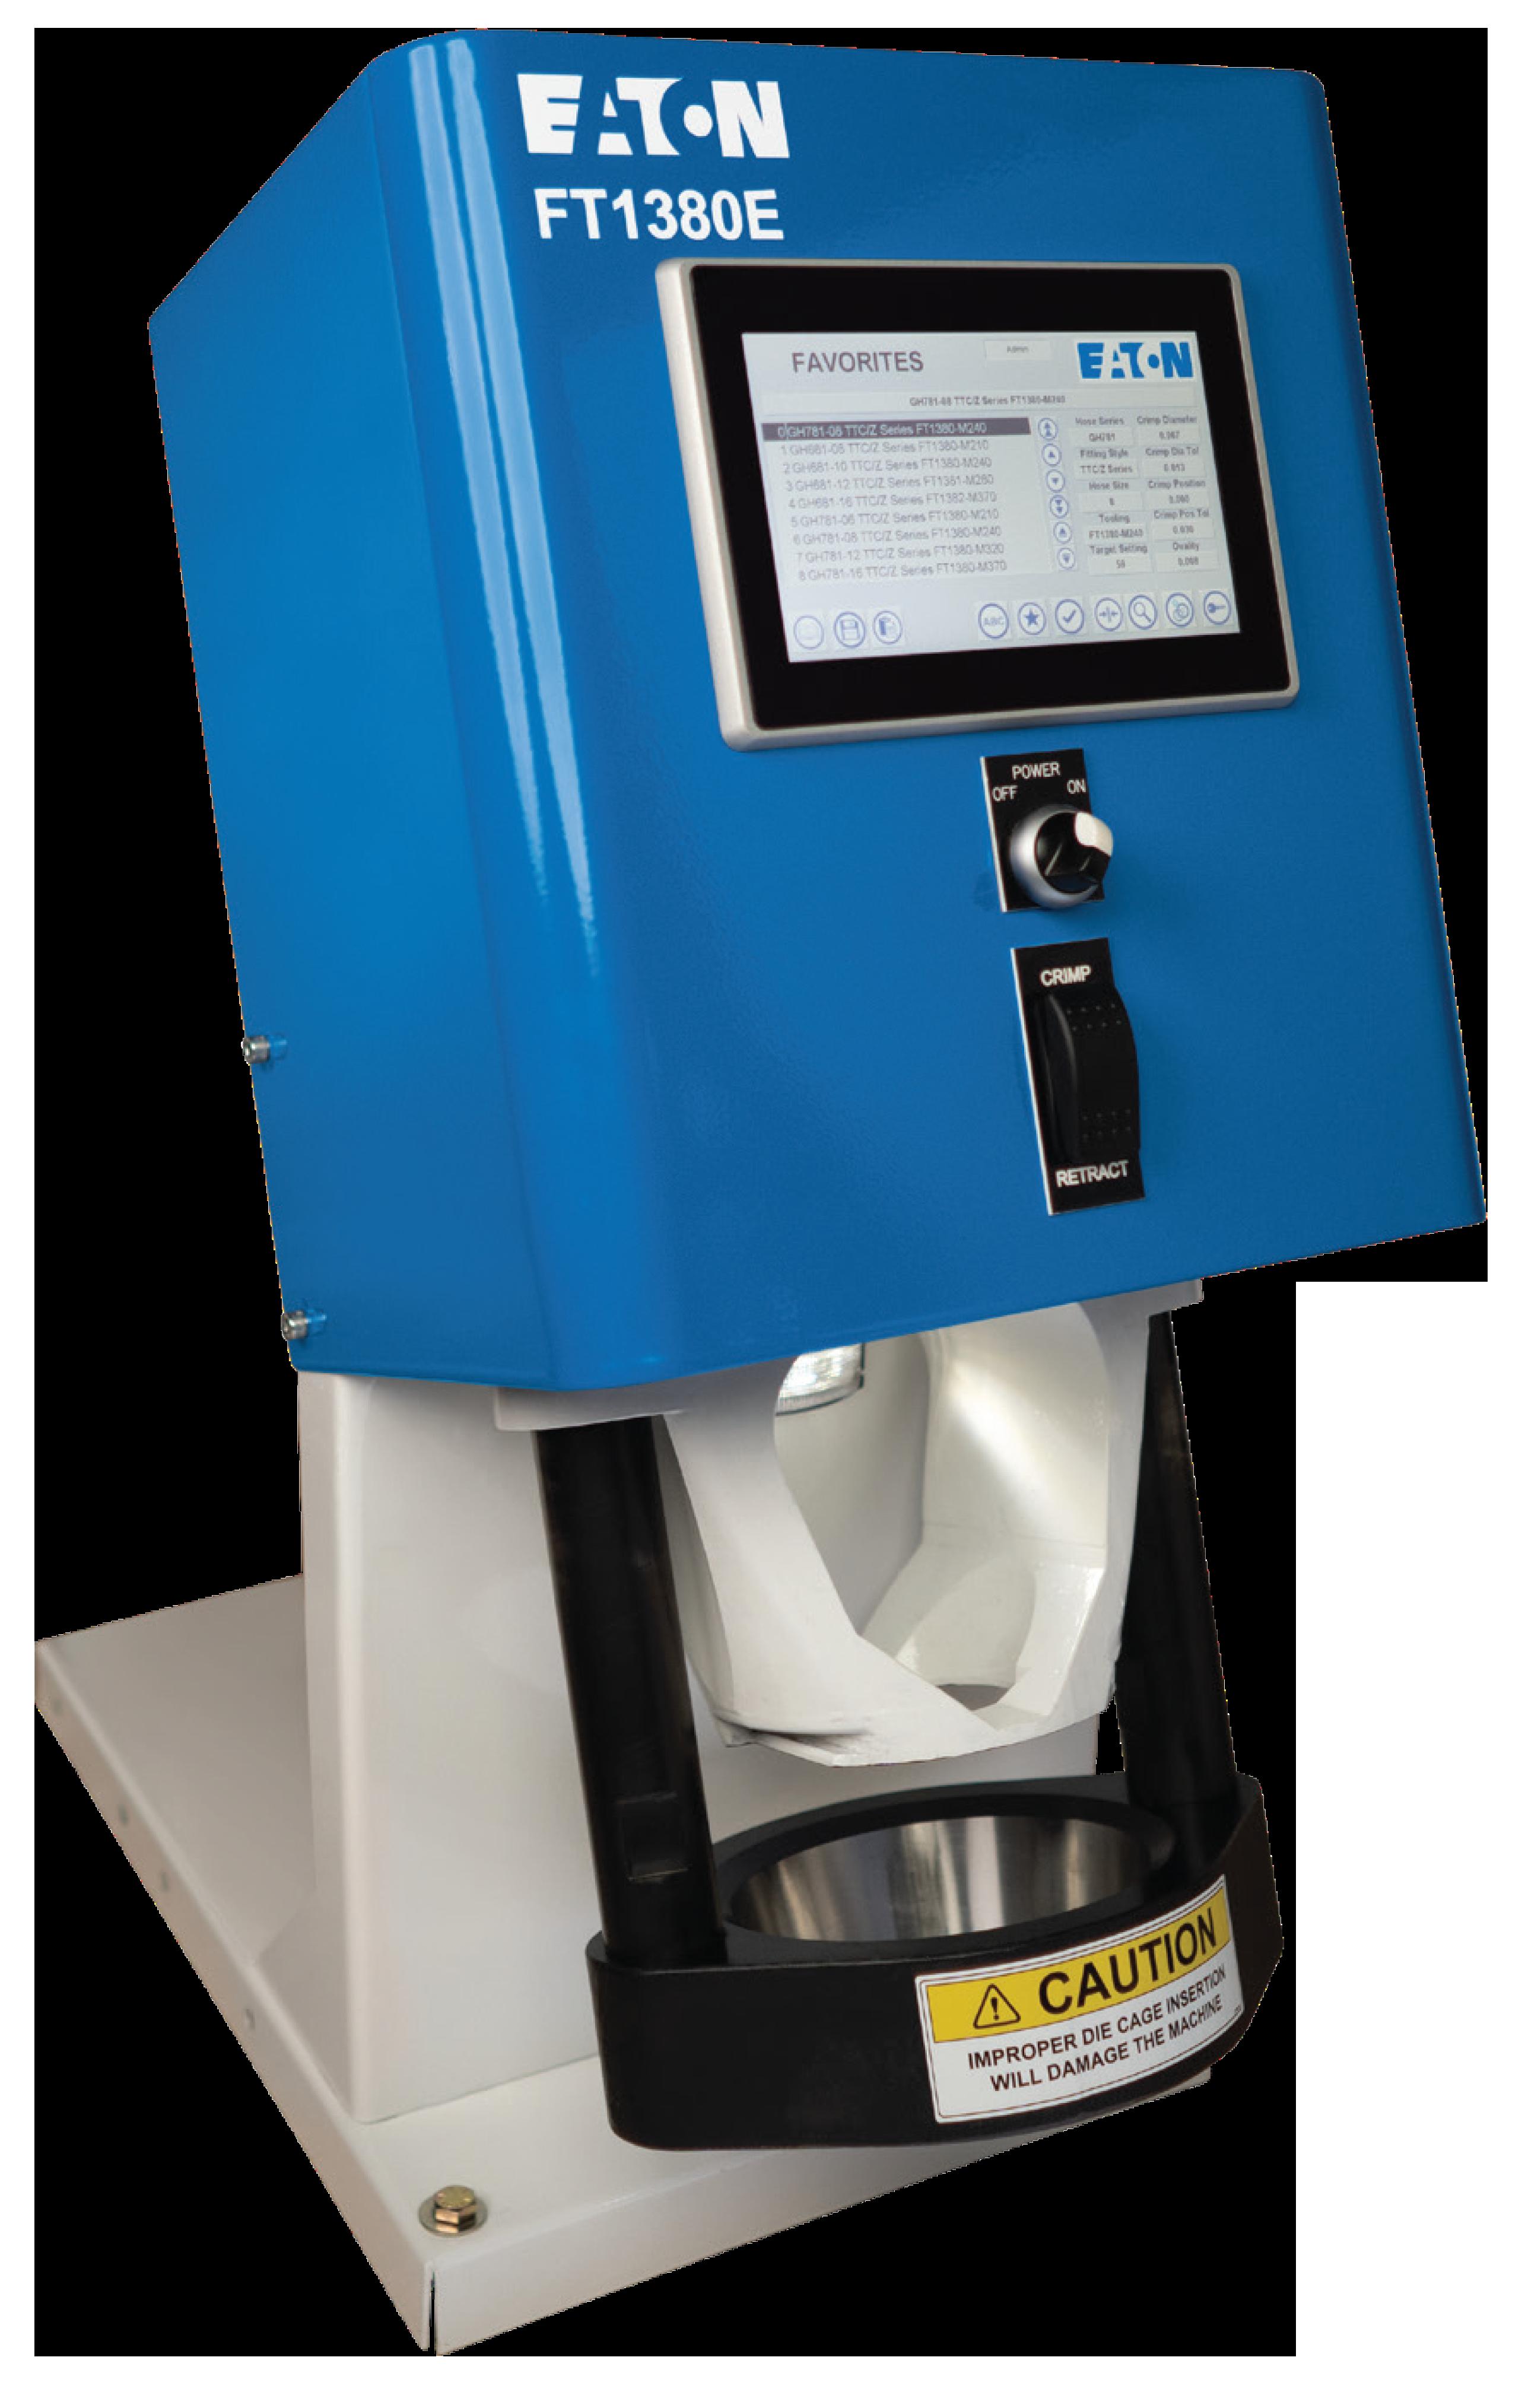 Eaton FT1380e electronic crimp machine